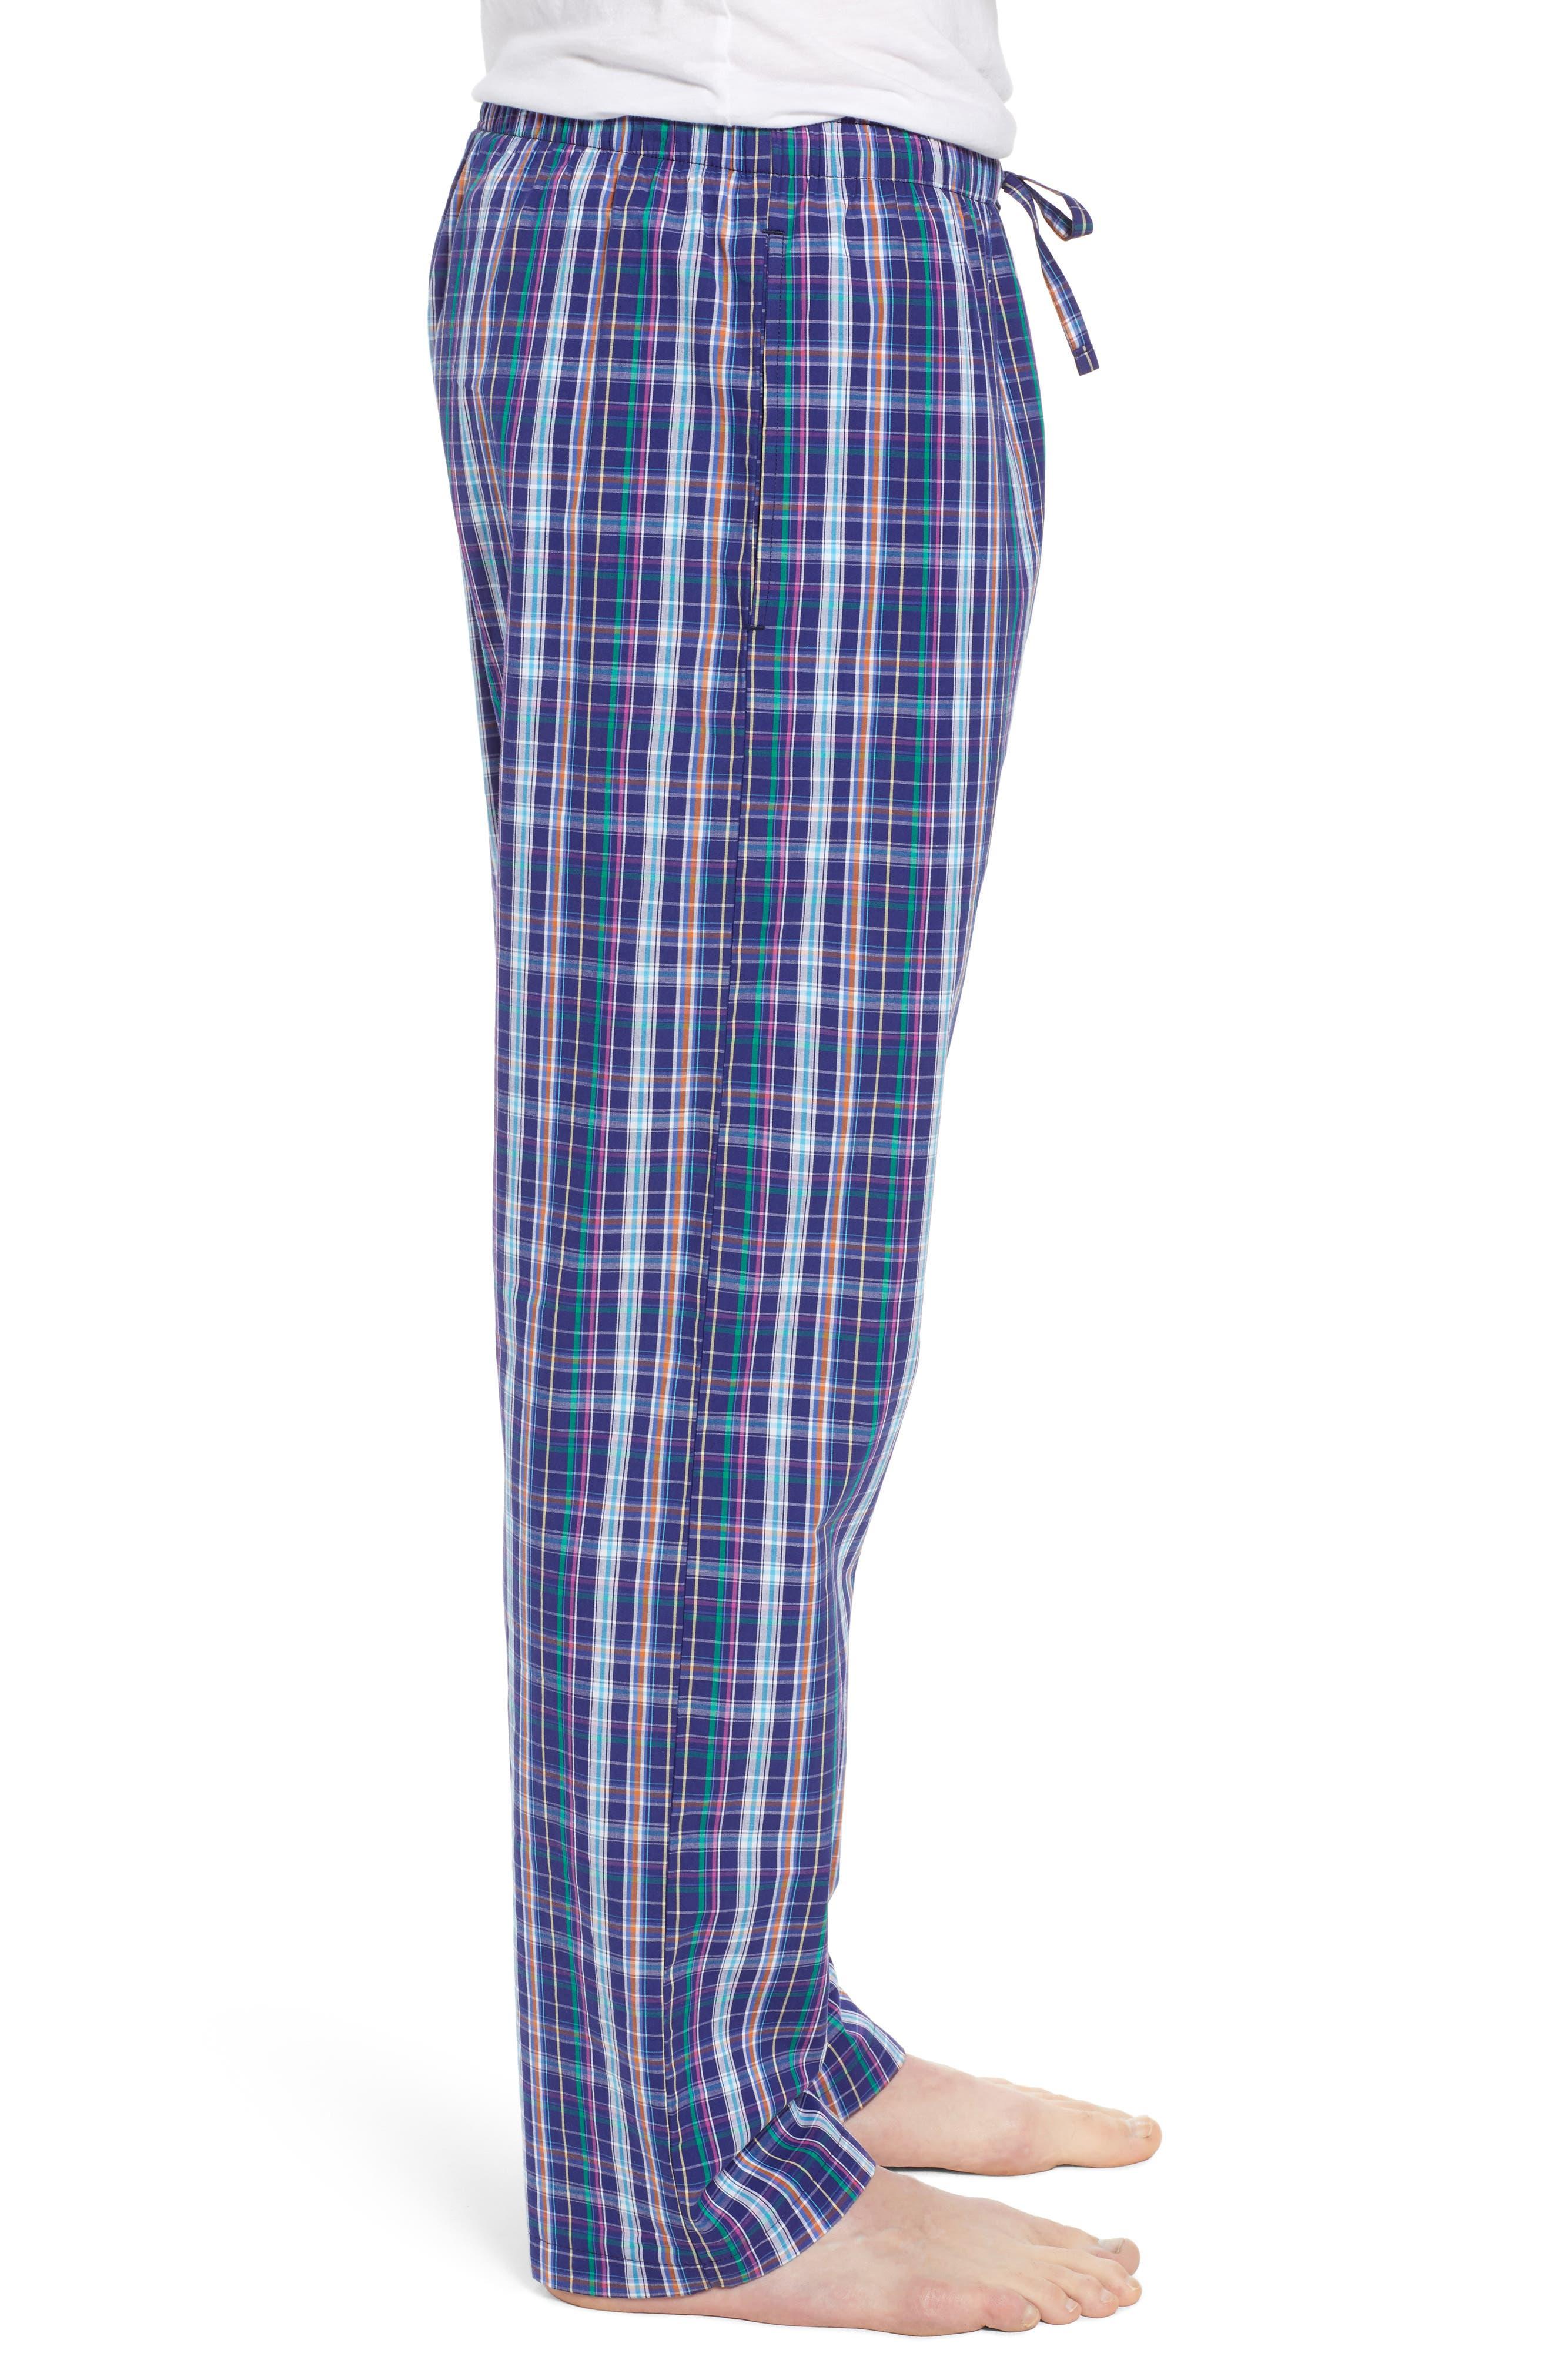 Cotton Lounge Pants,                             Alternate thumbnail 3, color,                             Alton Plaid/ May Orange